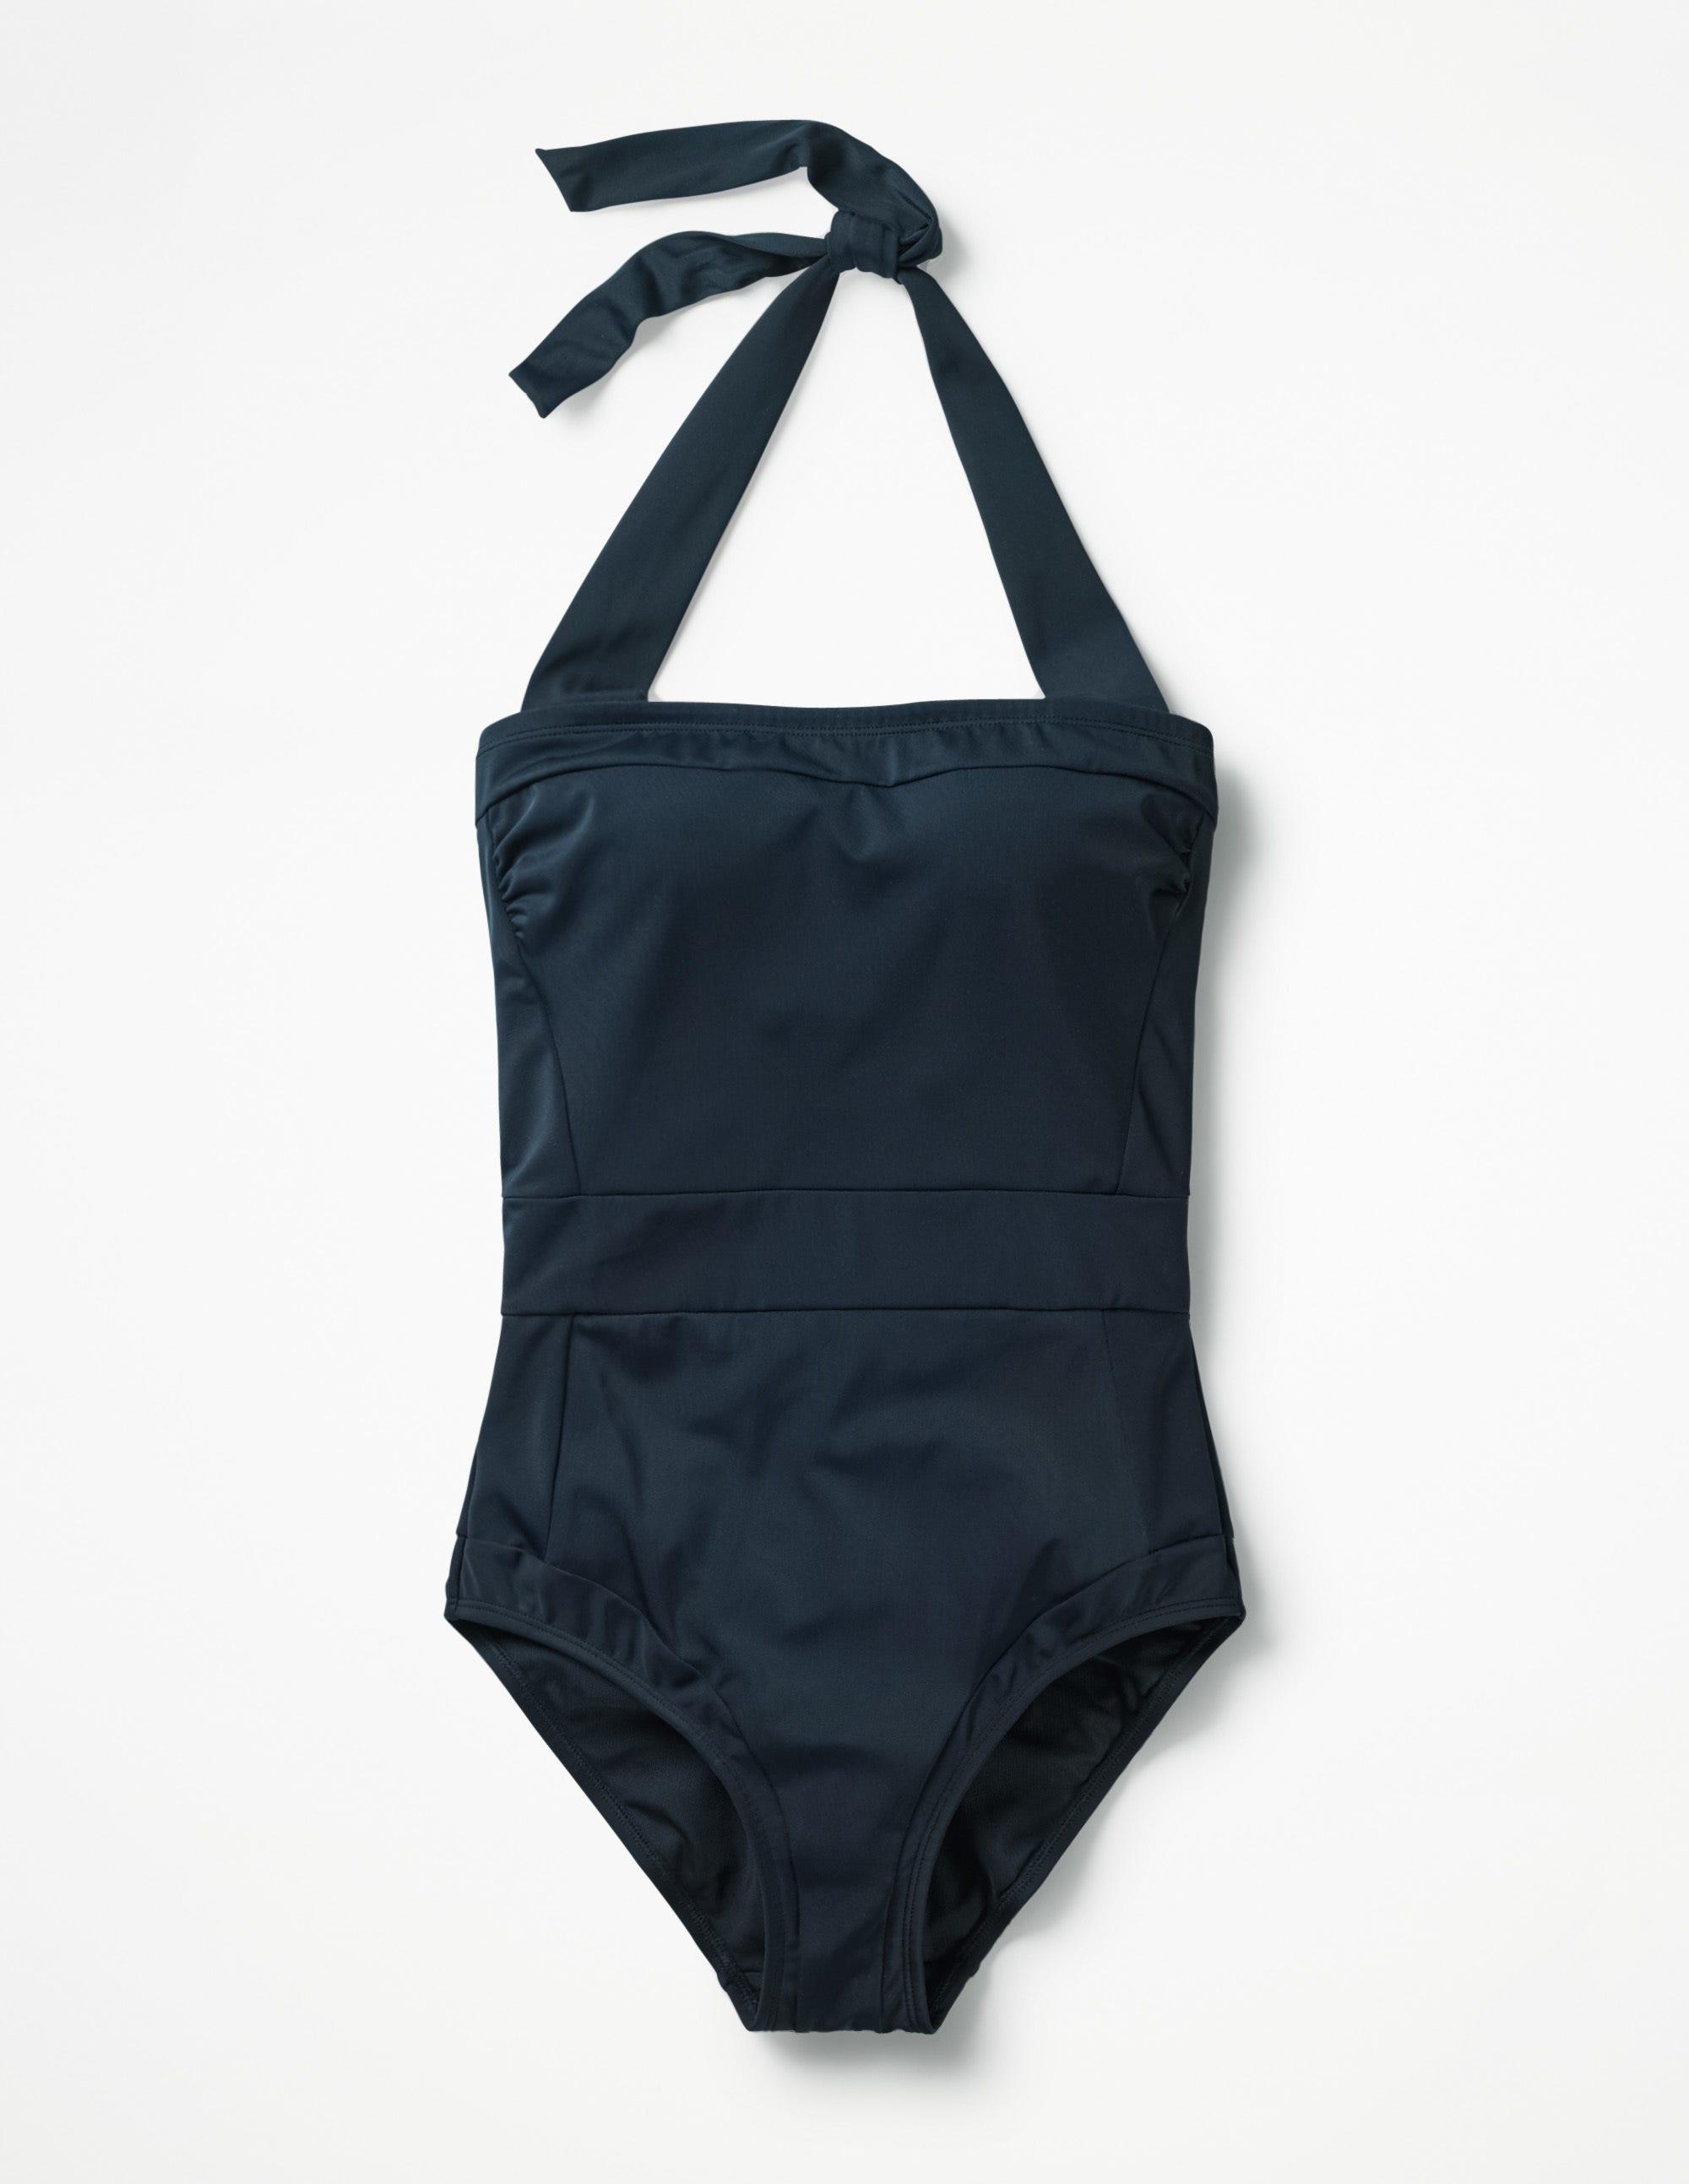 Maillot de bain Santorini Navy Femme Boden